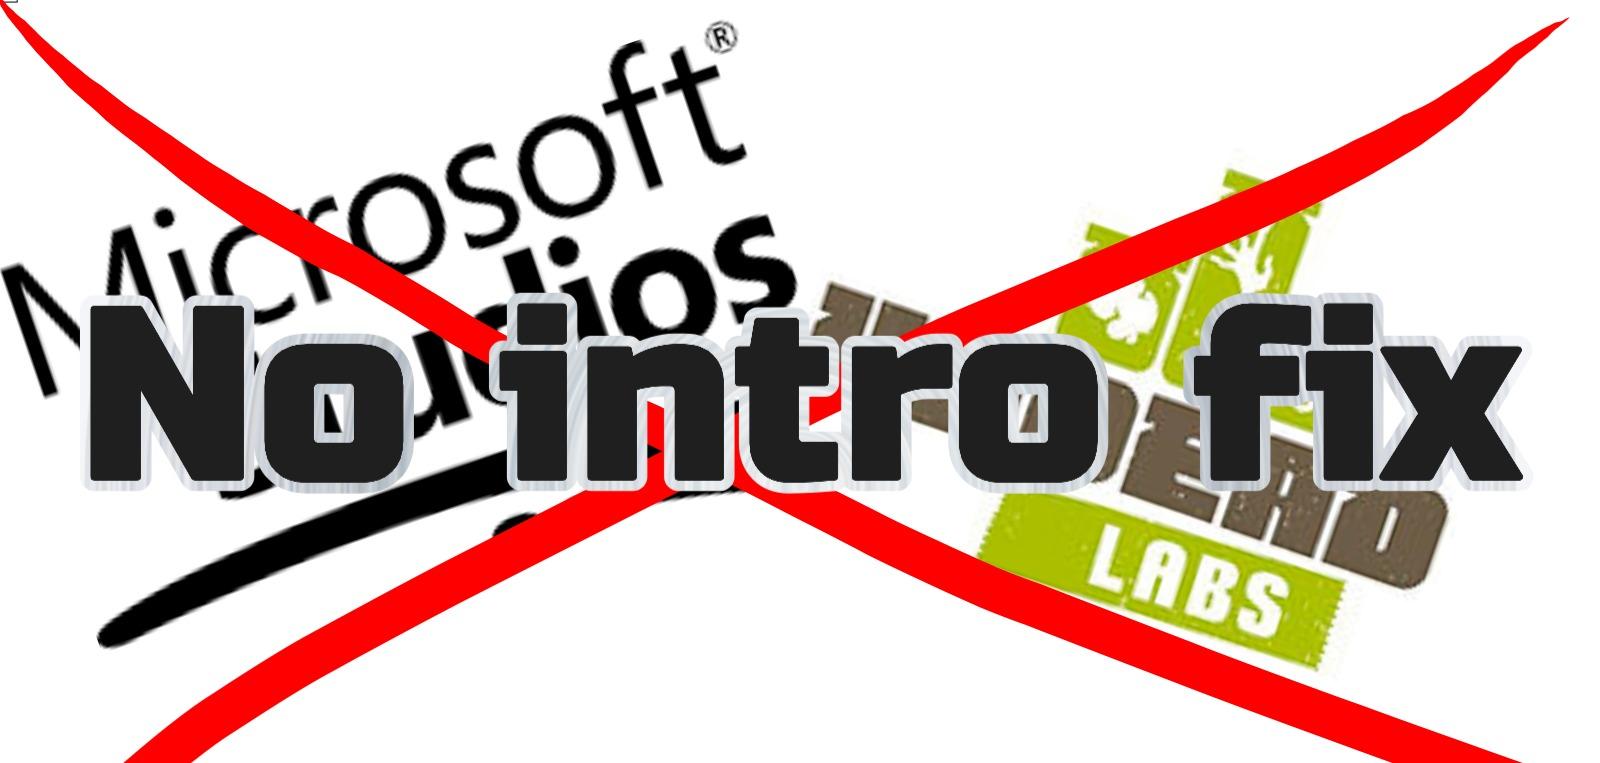 State of Decay 2 Windows, XONE game - Mod DB